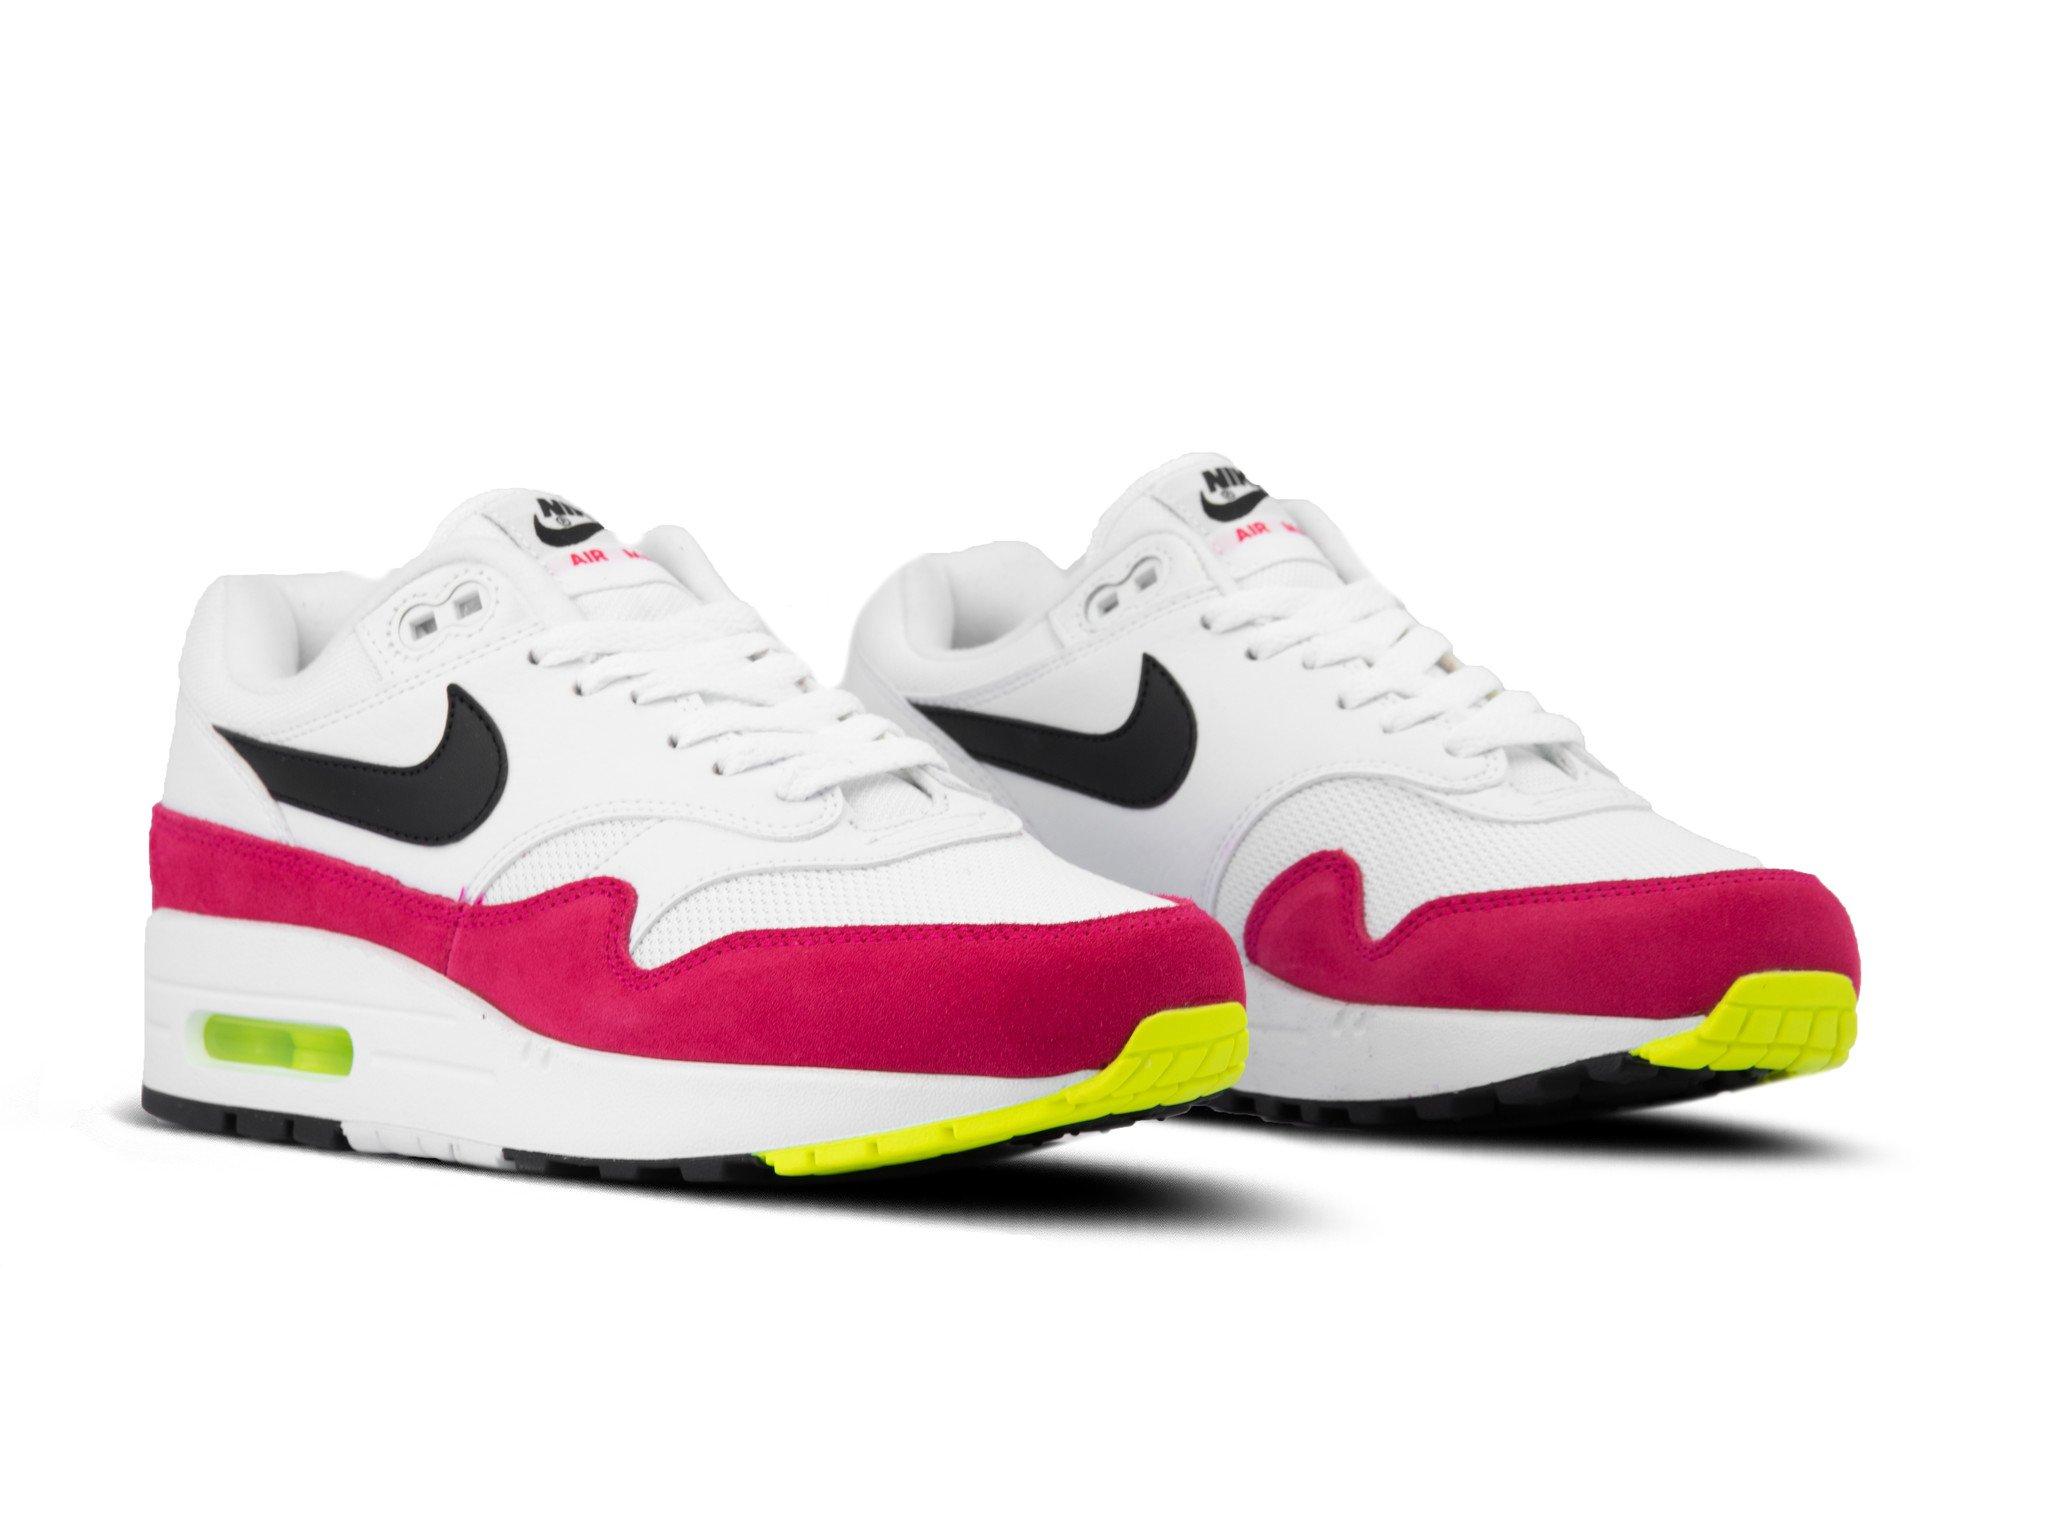 Nike Air Max 1 White Black Volt Rush Pink AH8145 111 | Bruut